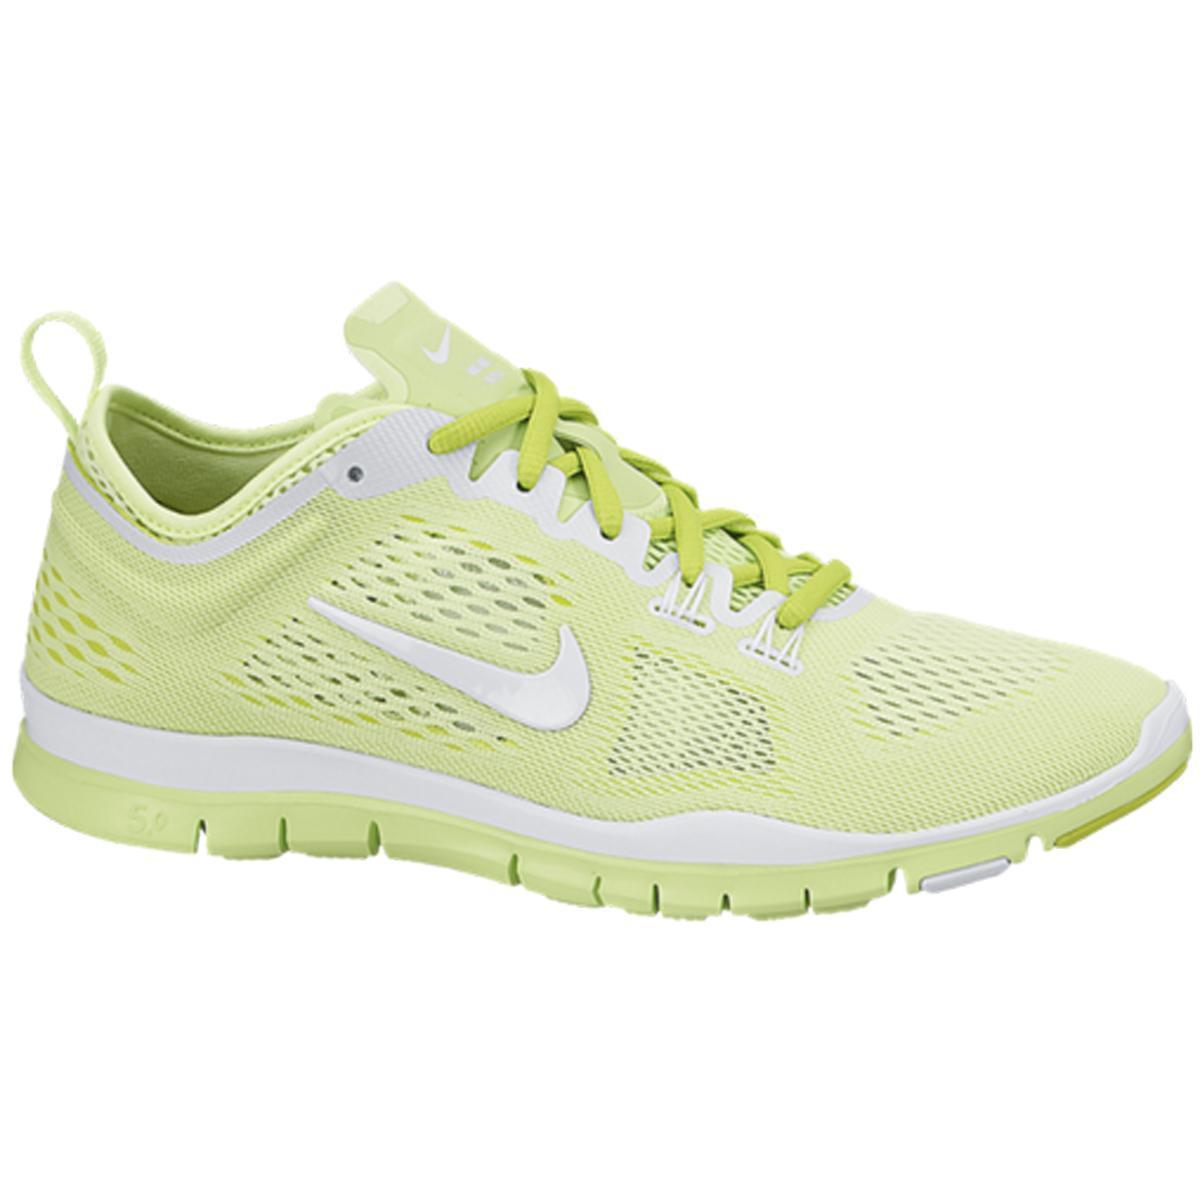 Nike Damenns Free 5.0 TR Fit 4 Breath Training schuhe Lime Green